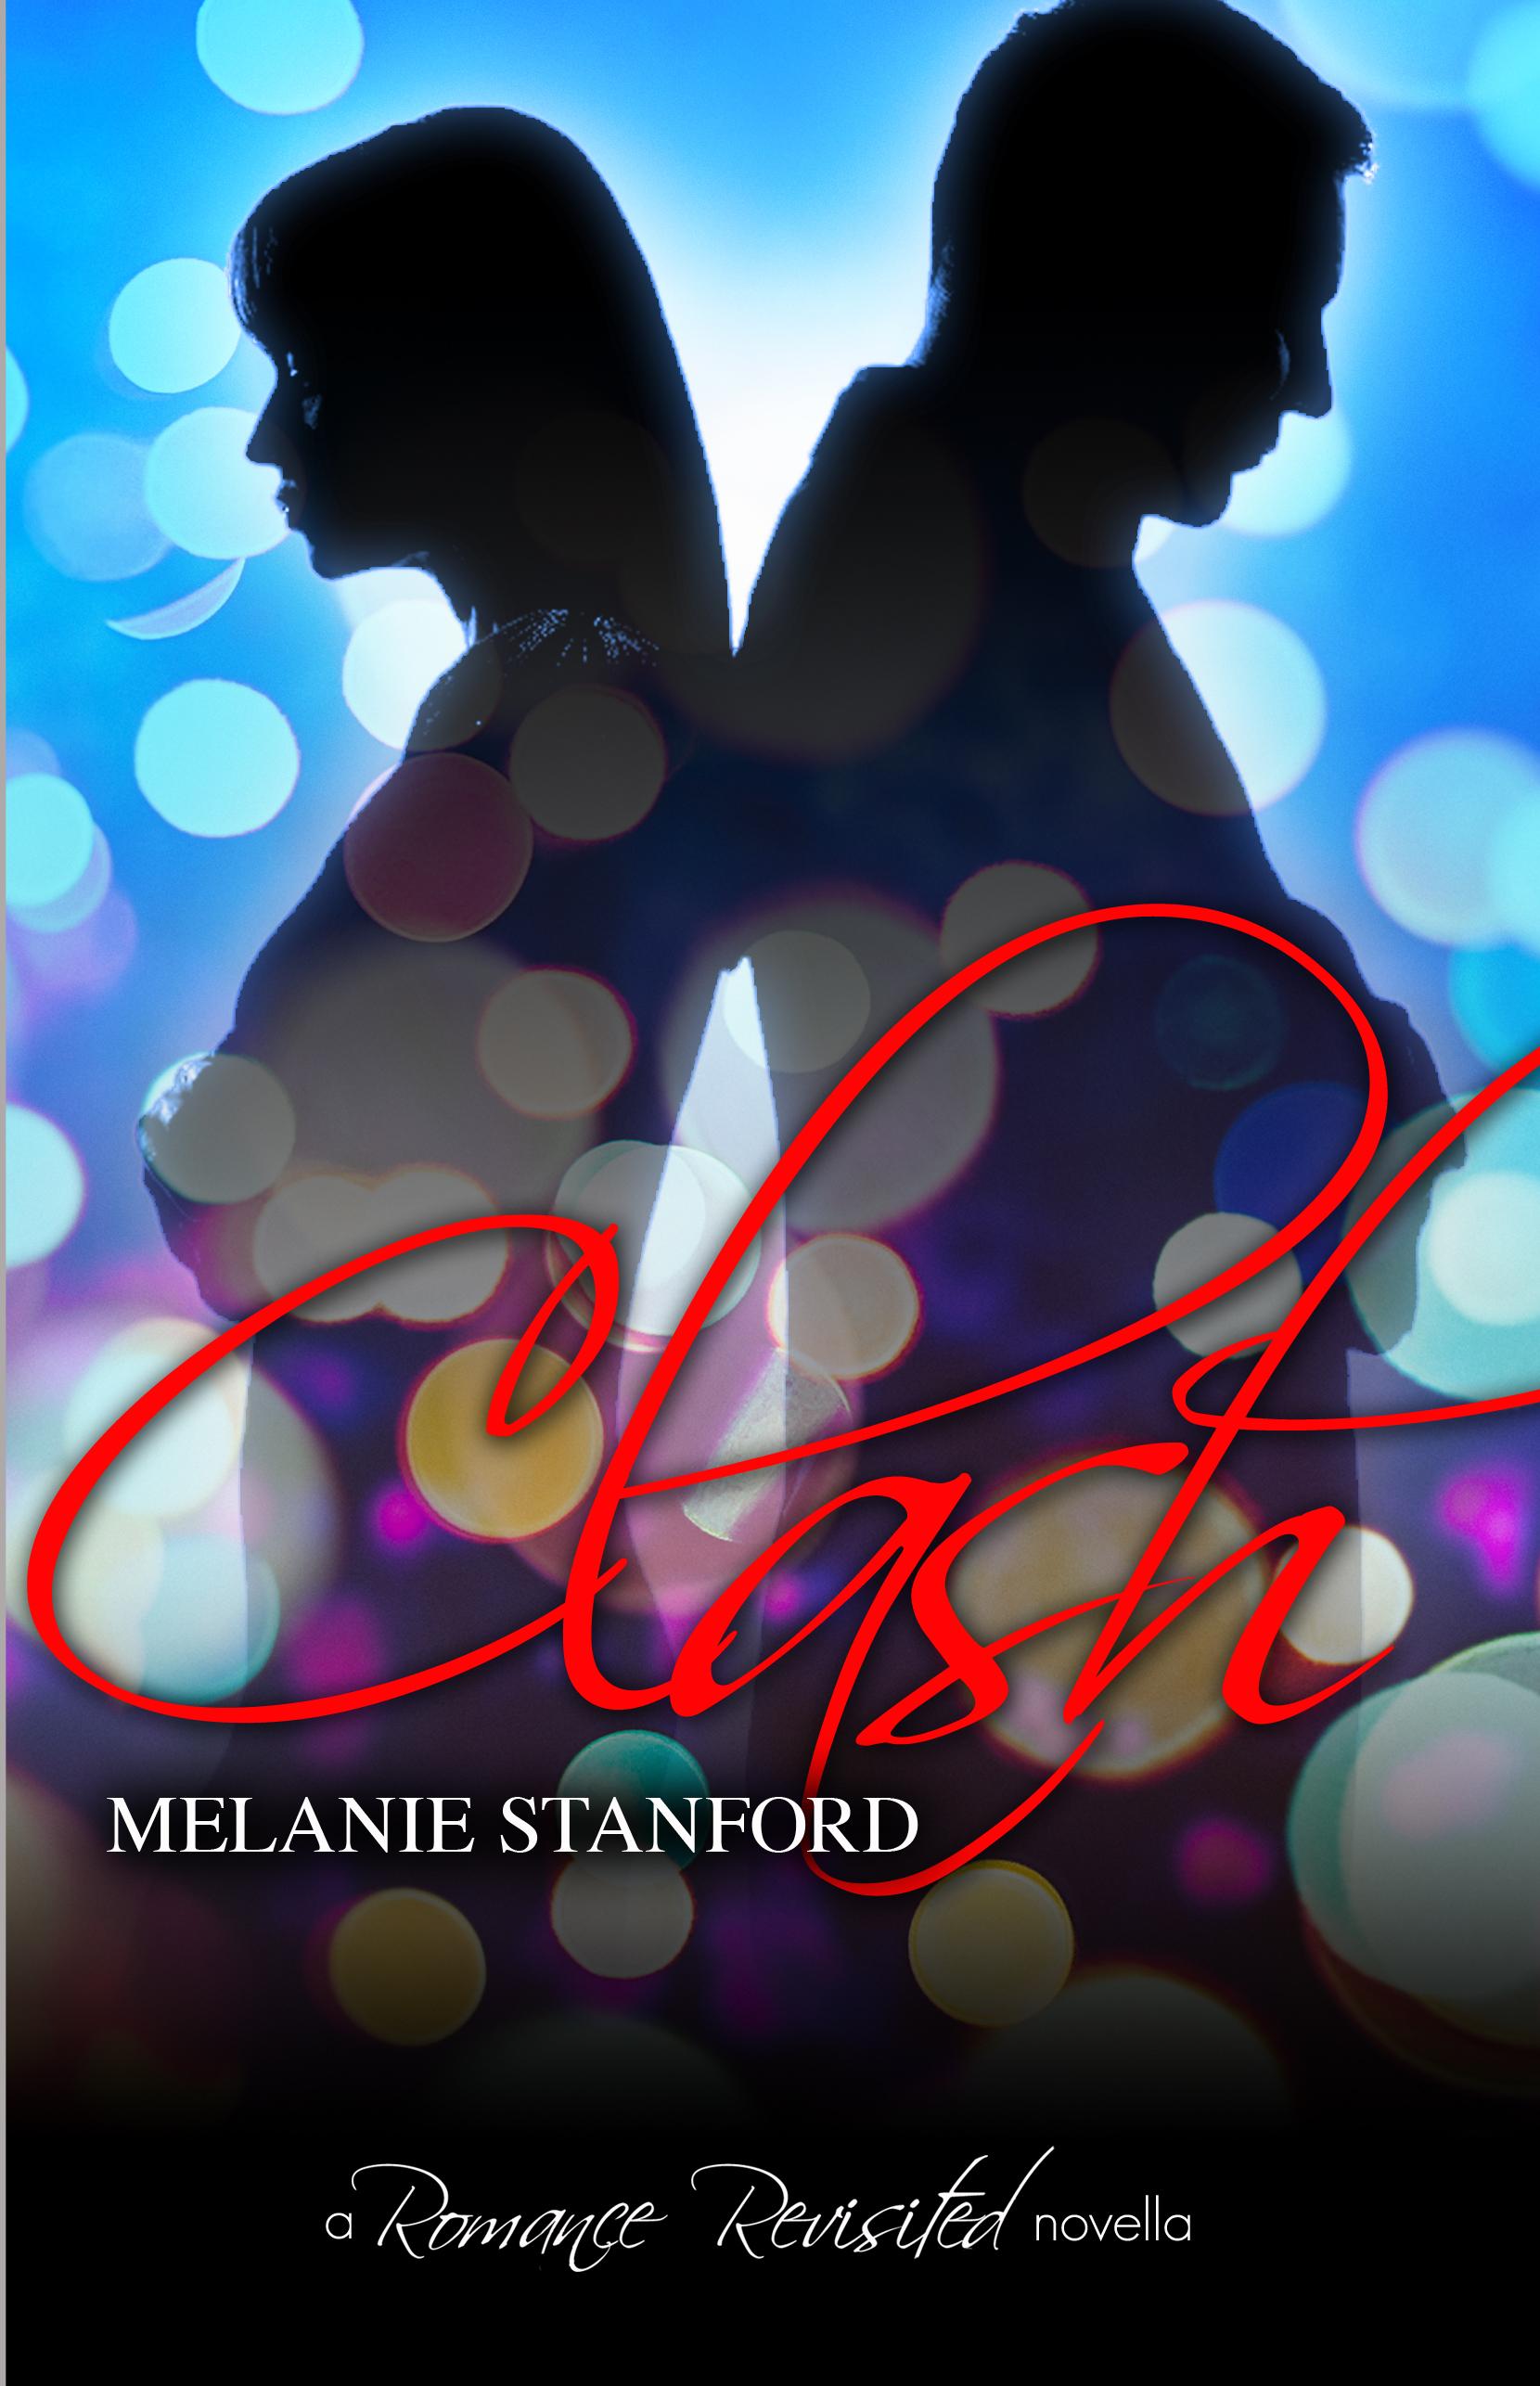 Clash cover ebook.jpg